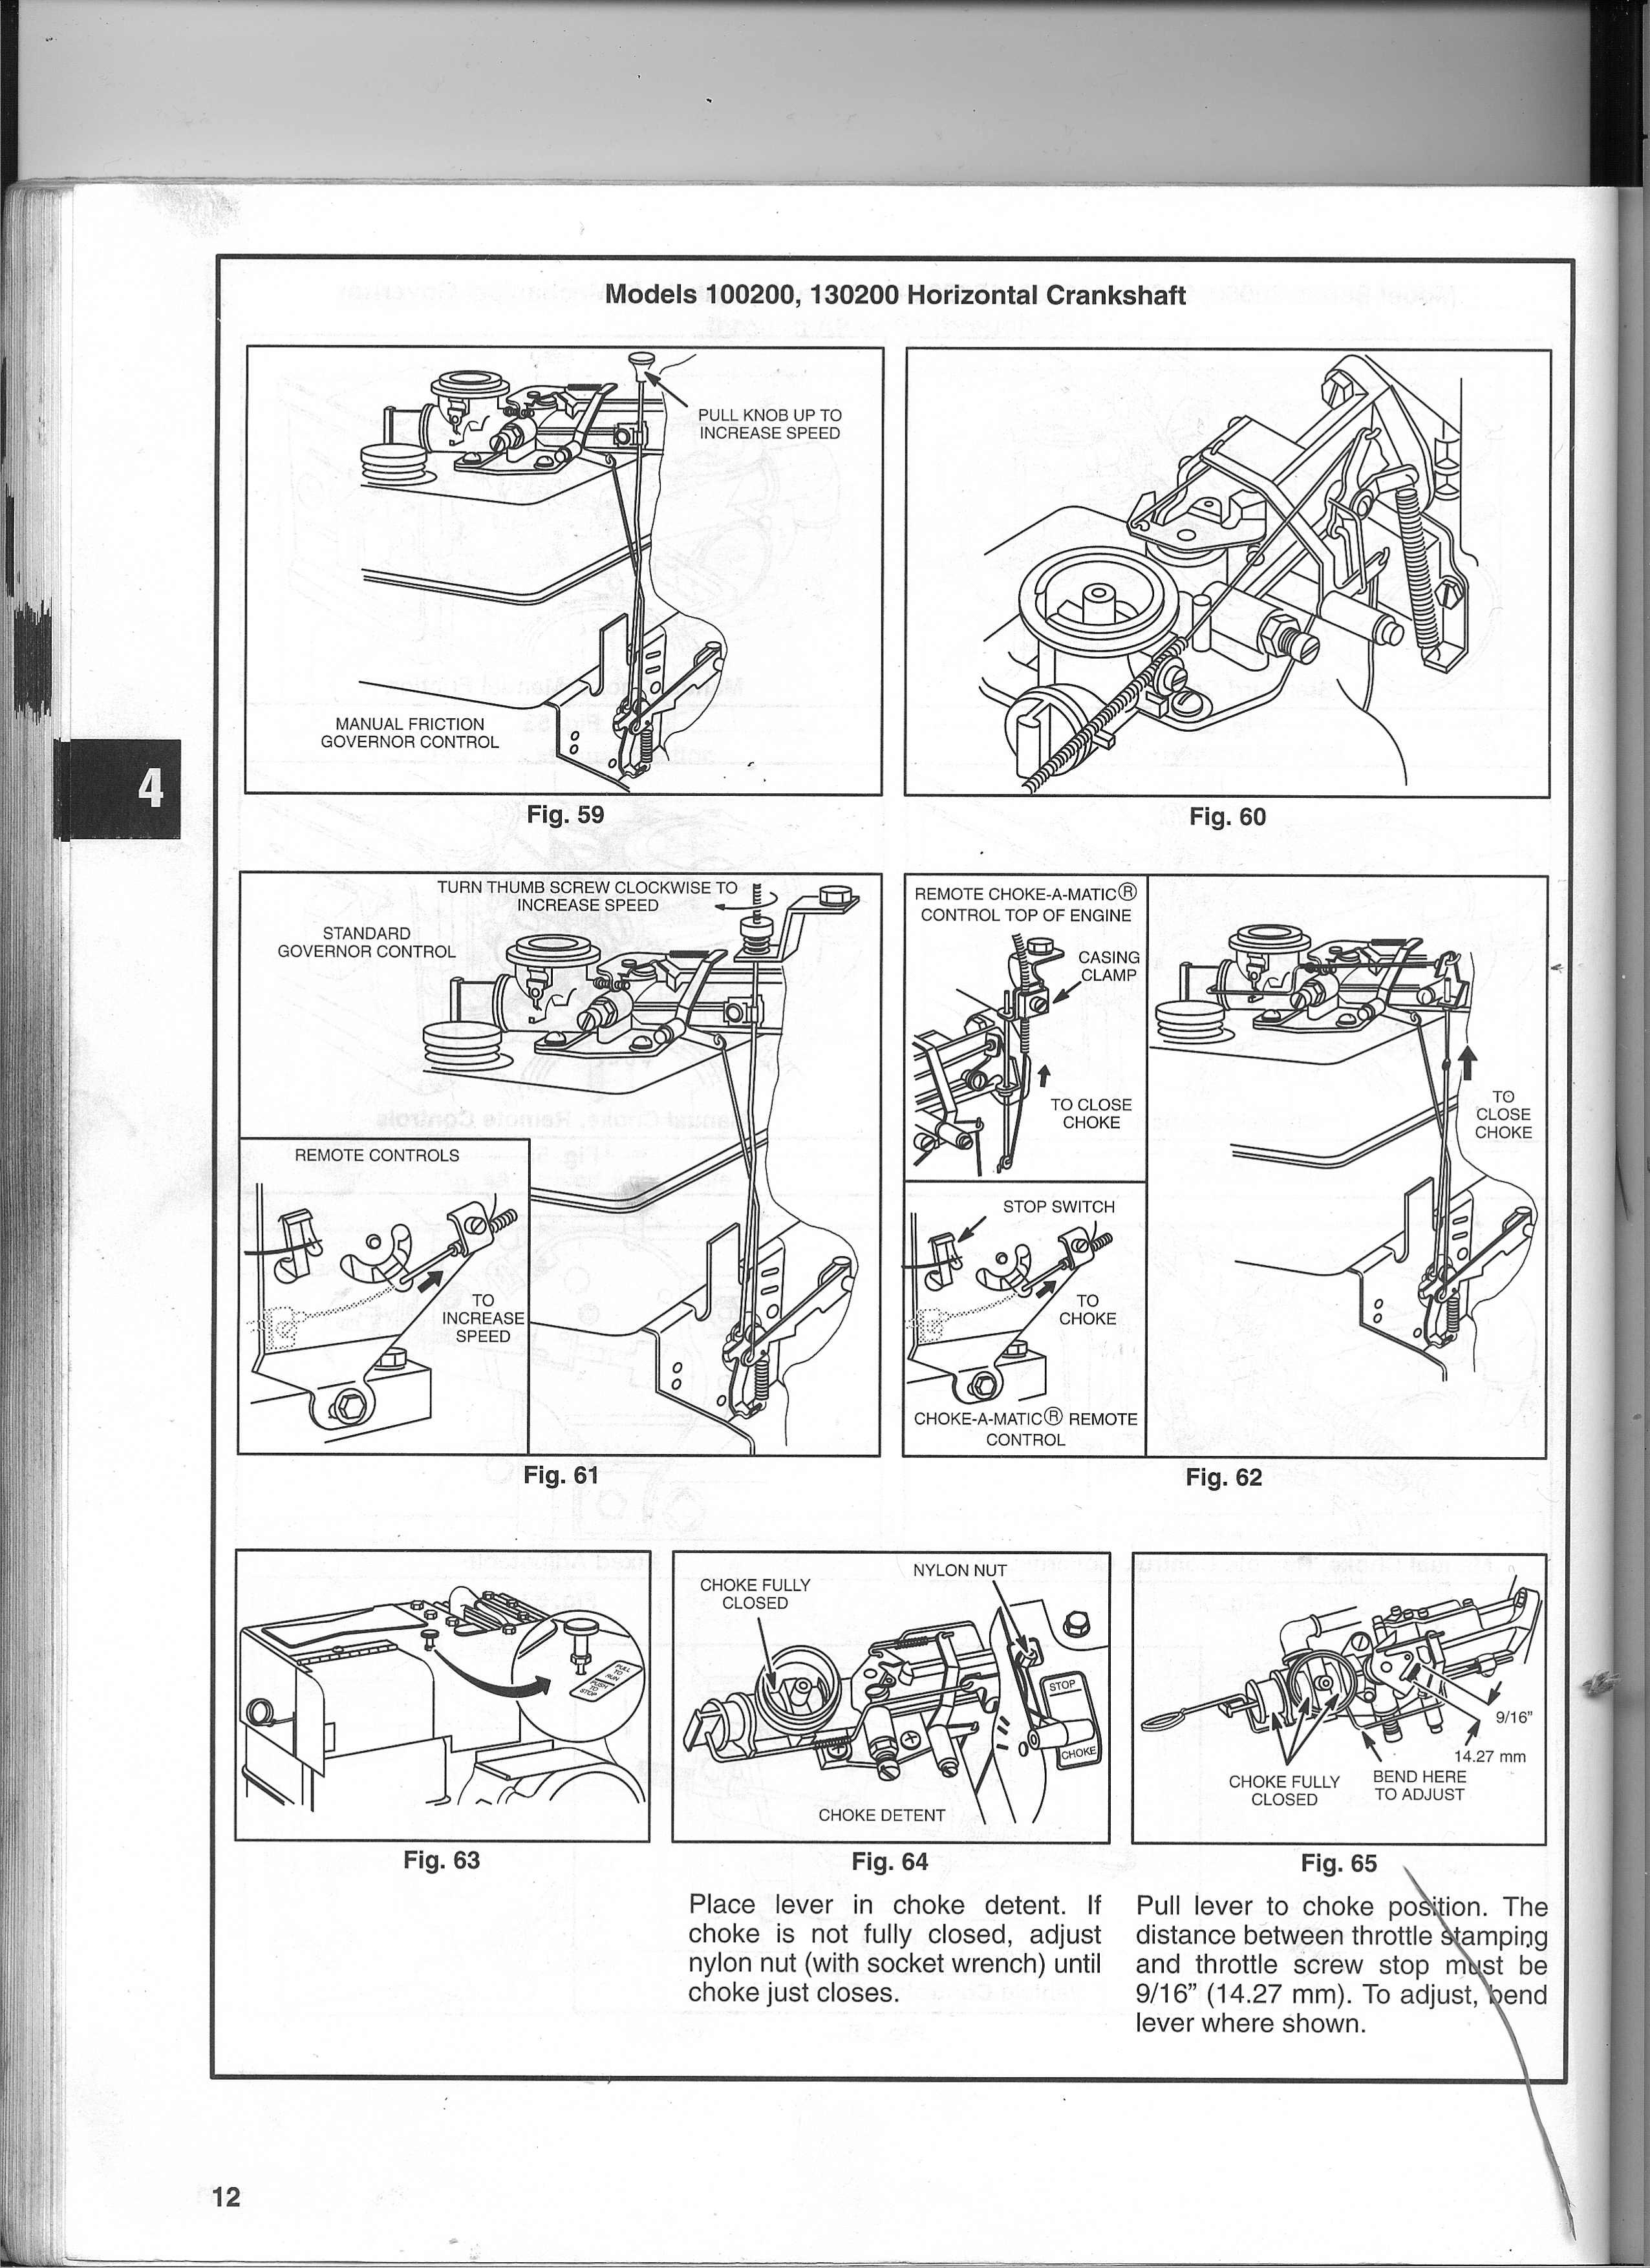 135202 manual rh 135202 manual elzplorers de Briggs and Stratton Model  135202 Engine Briggs and Stratton 135202 Manual